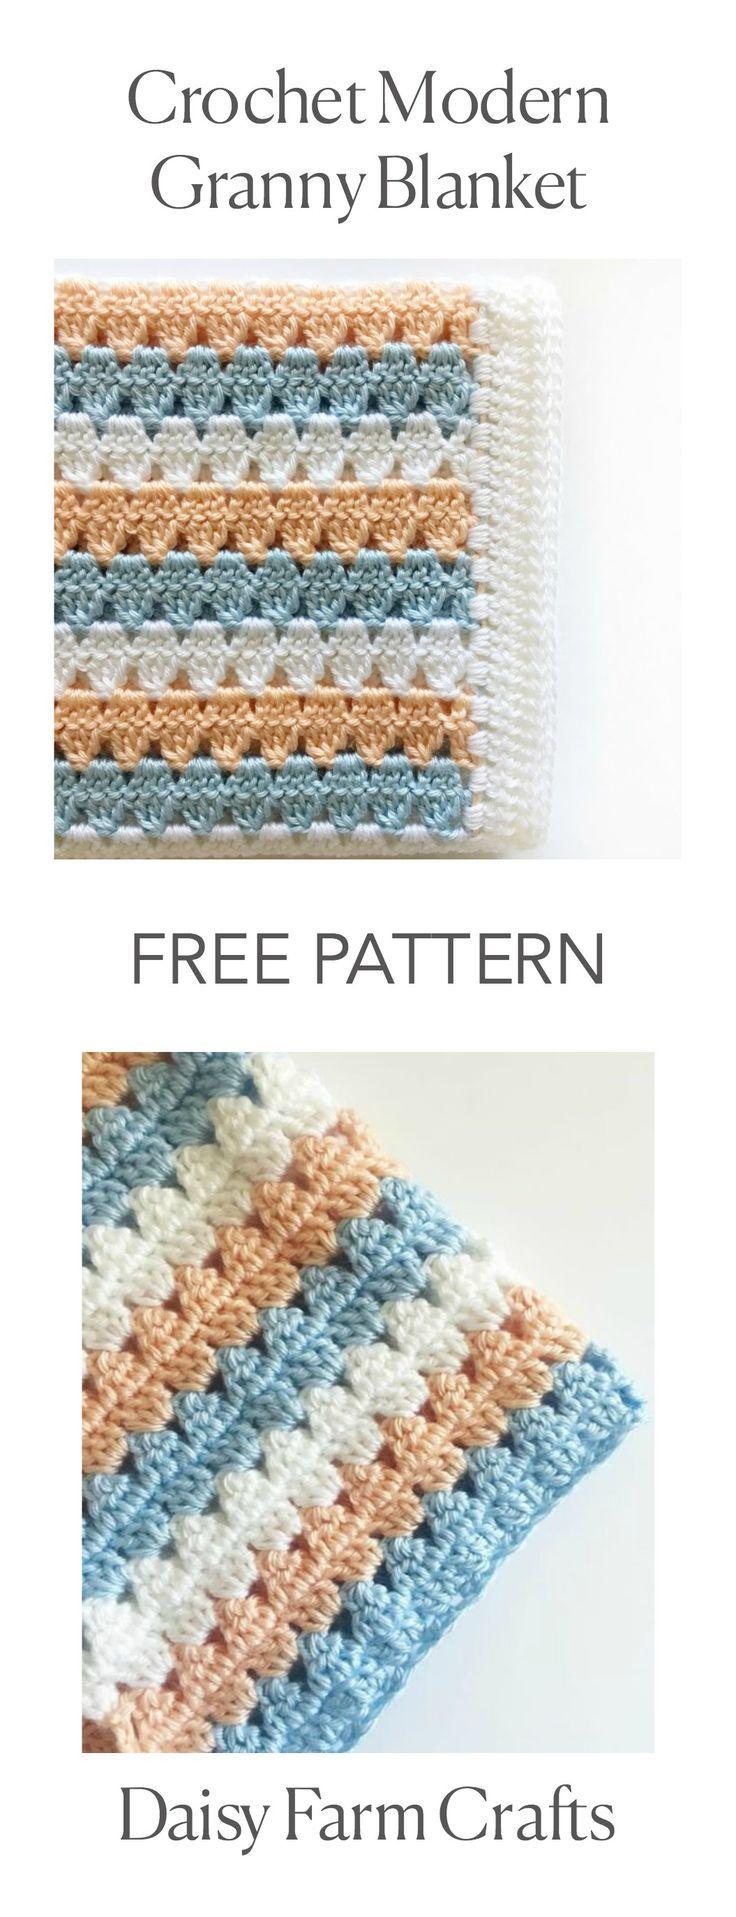 FREE PATTERN - Crochet Modern Granny Blanket in Peach and Blue